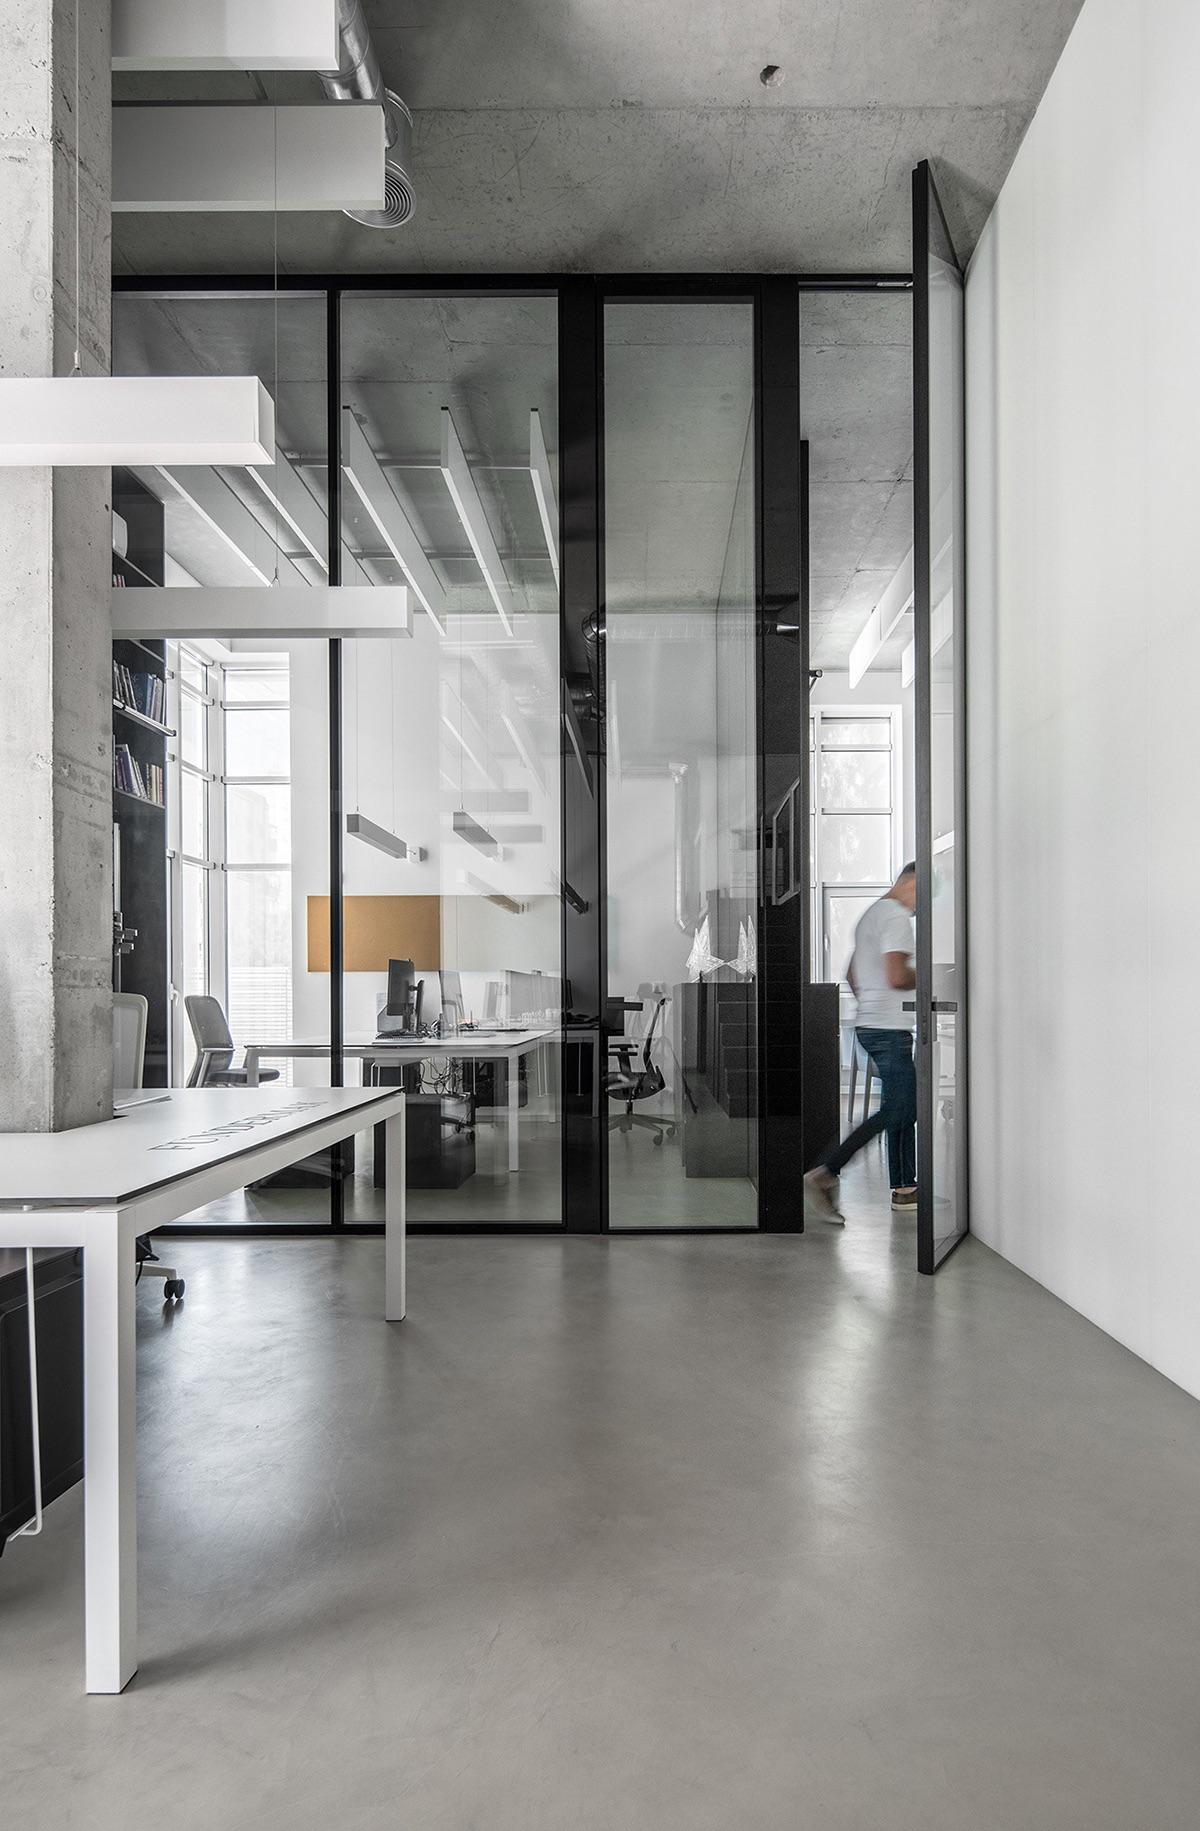 yod-design-lab-office-5